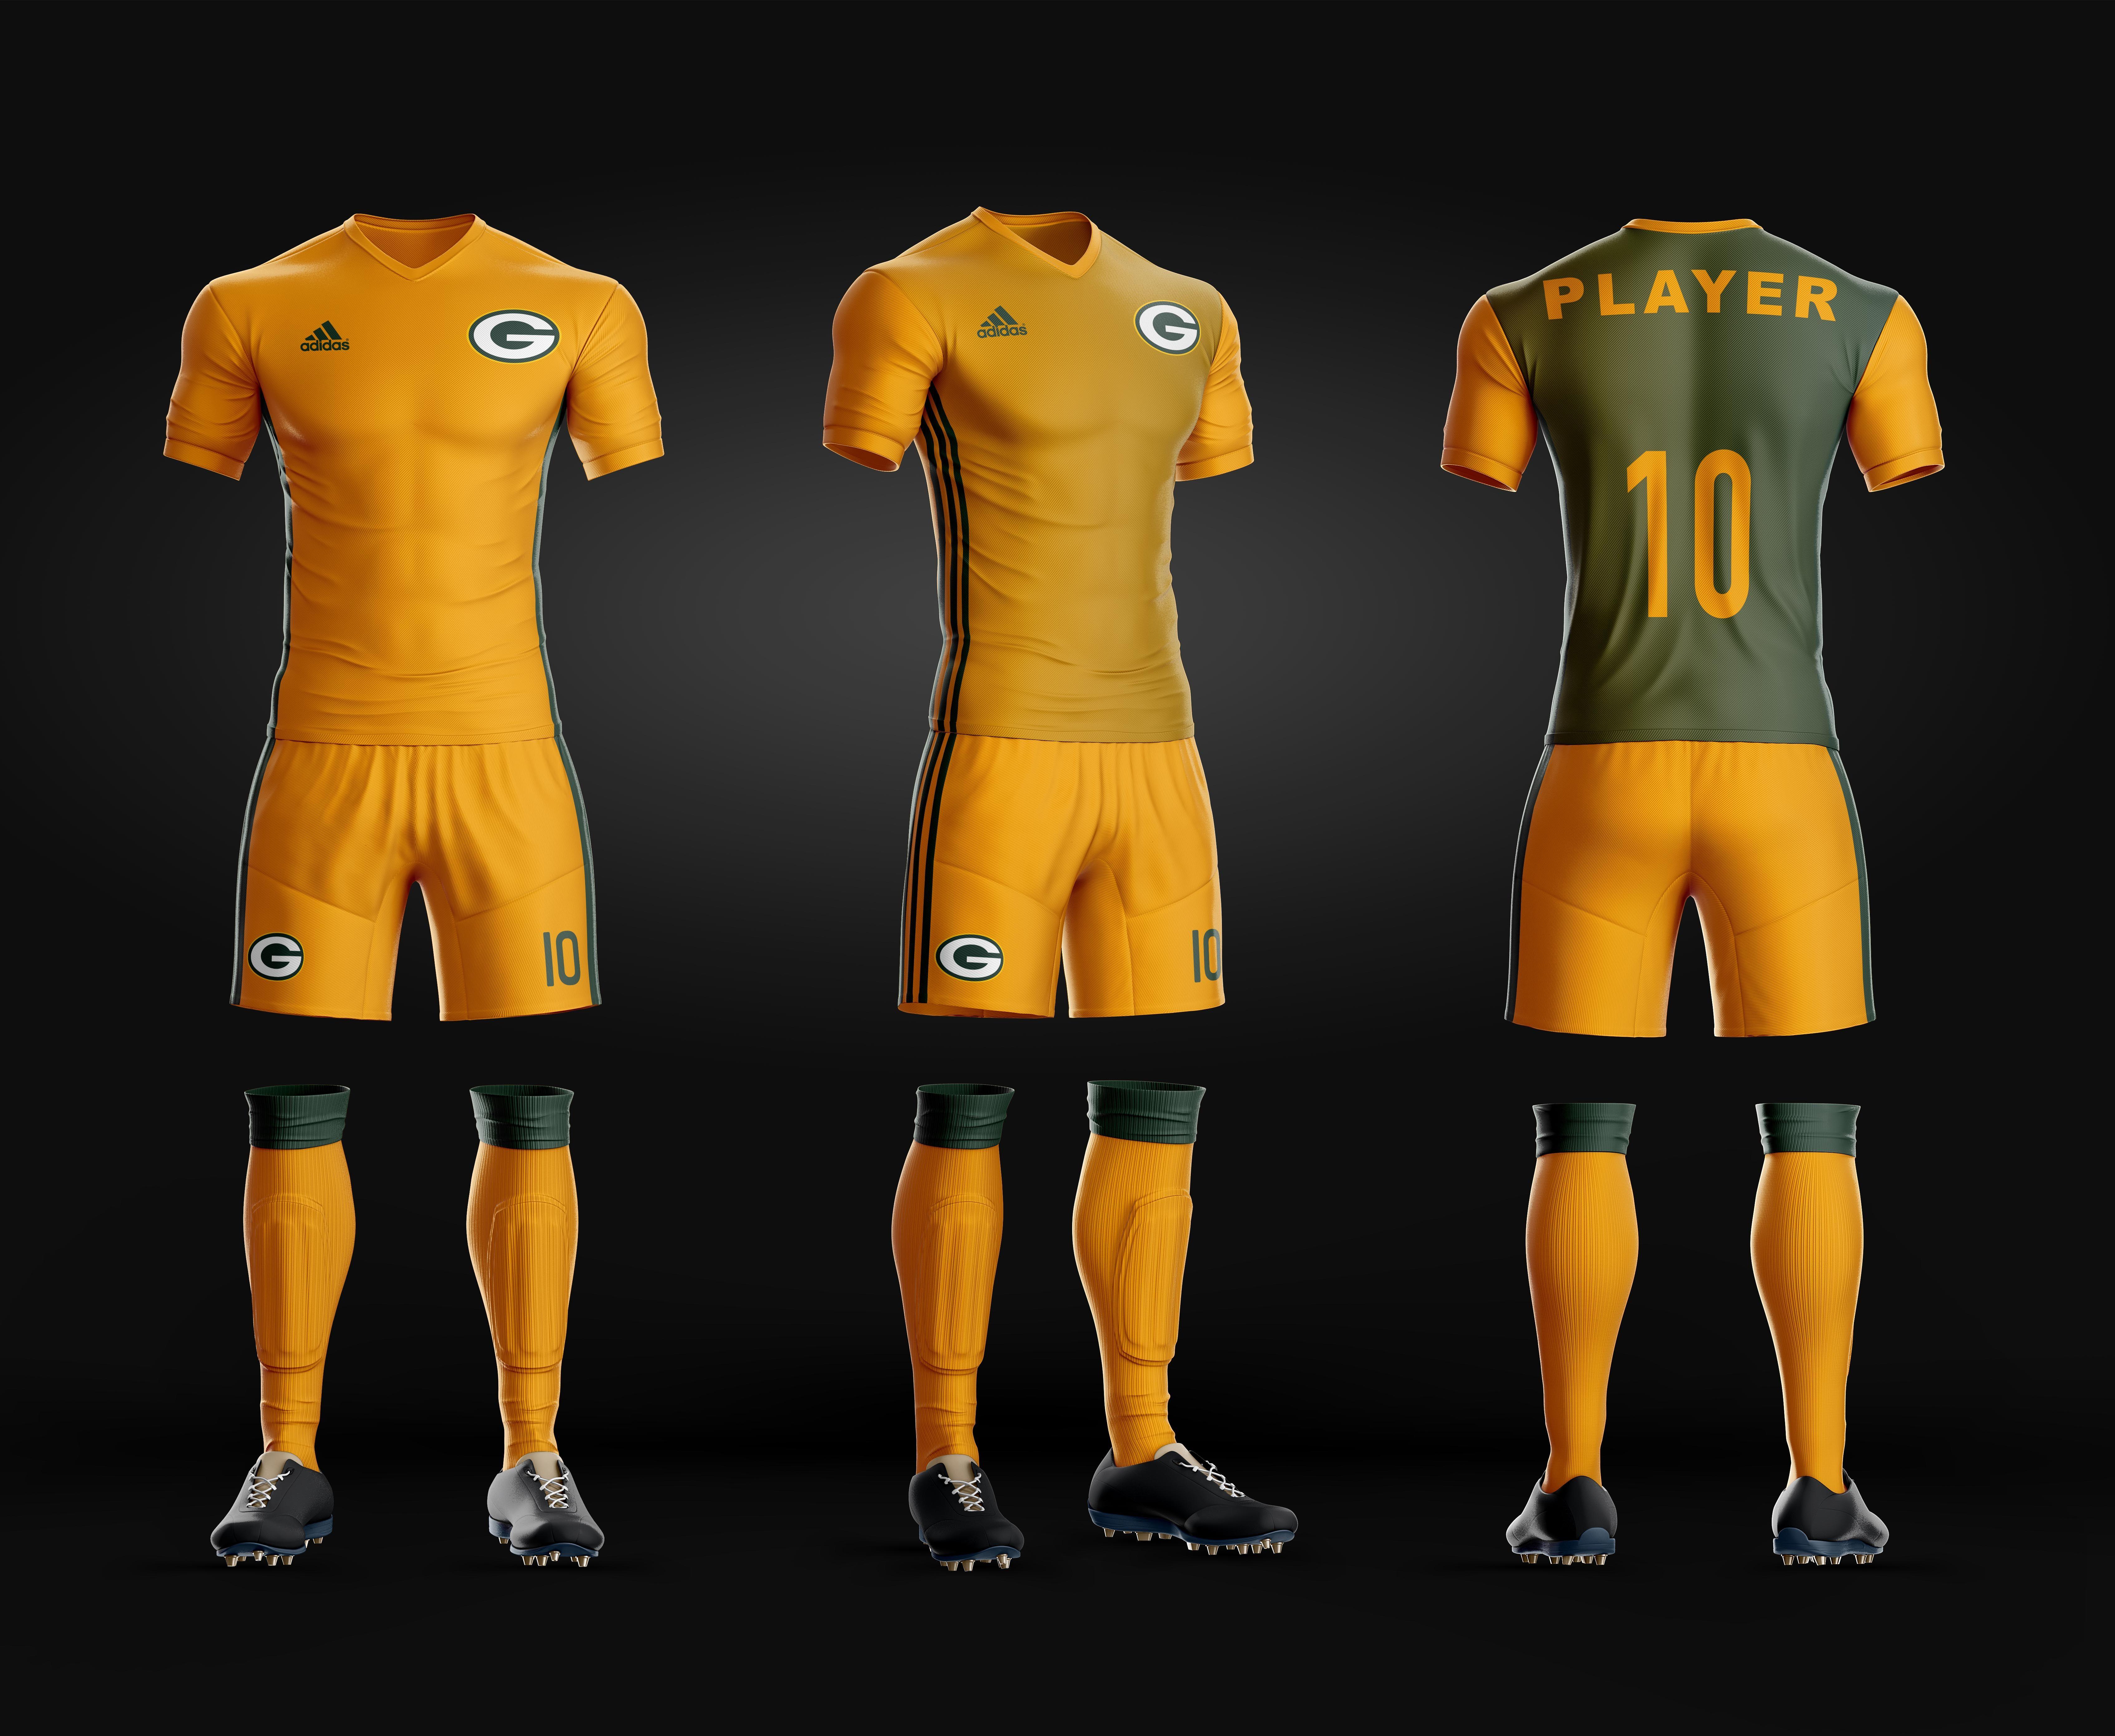 Soccer Uniform Green Bay Packers Away Uniform Remeras De Futbol Uniformes De Futbol Futbol